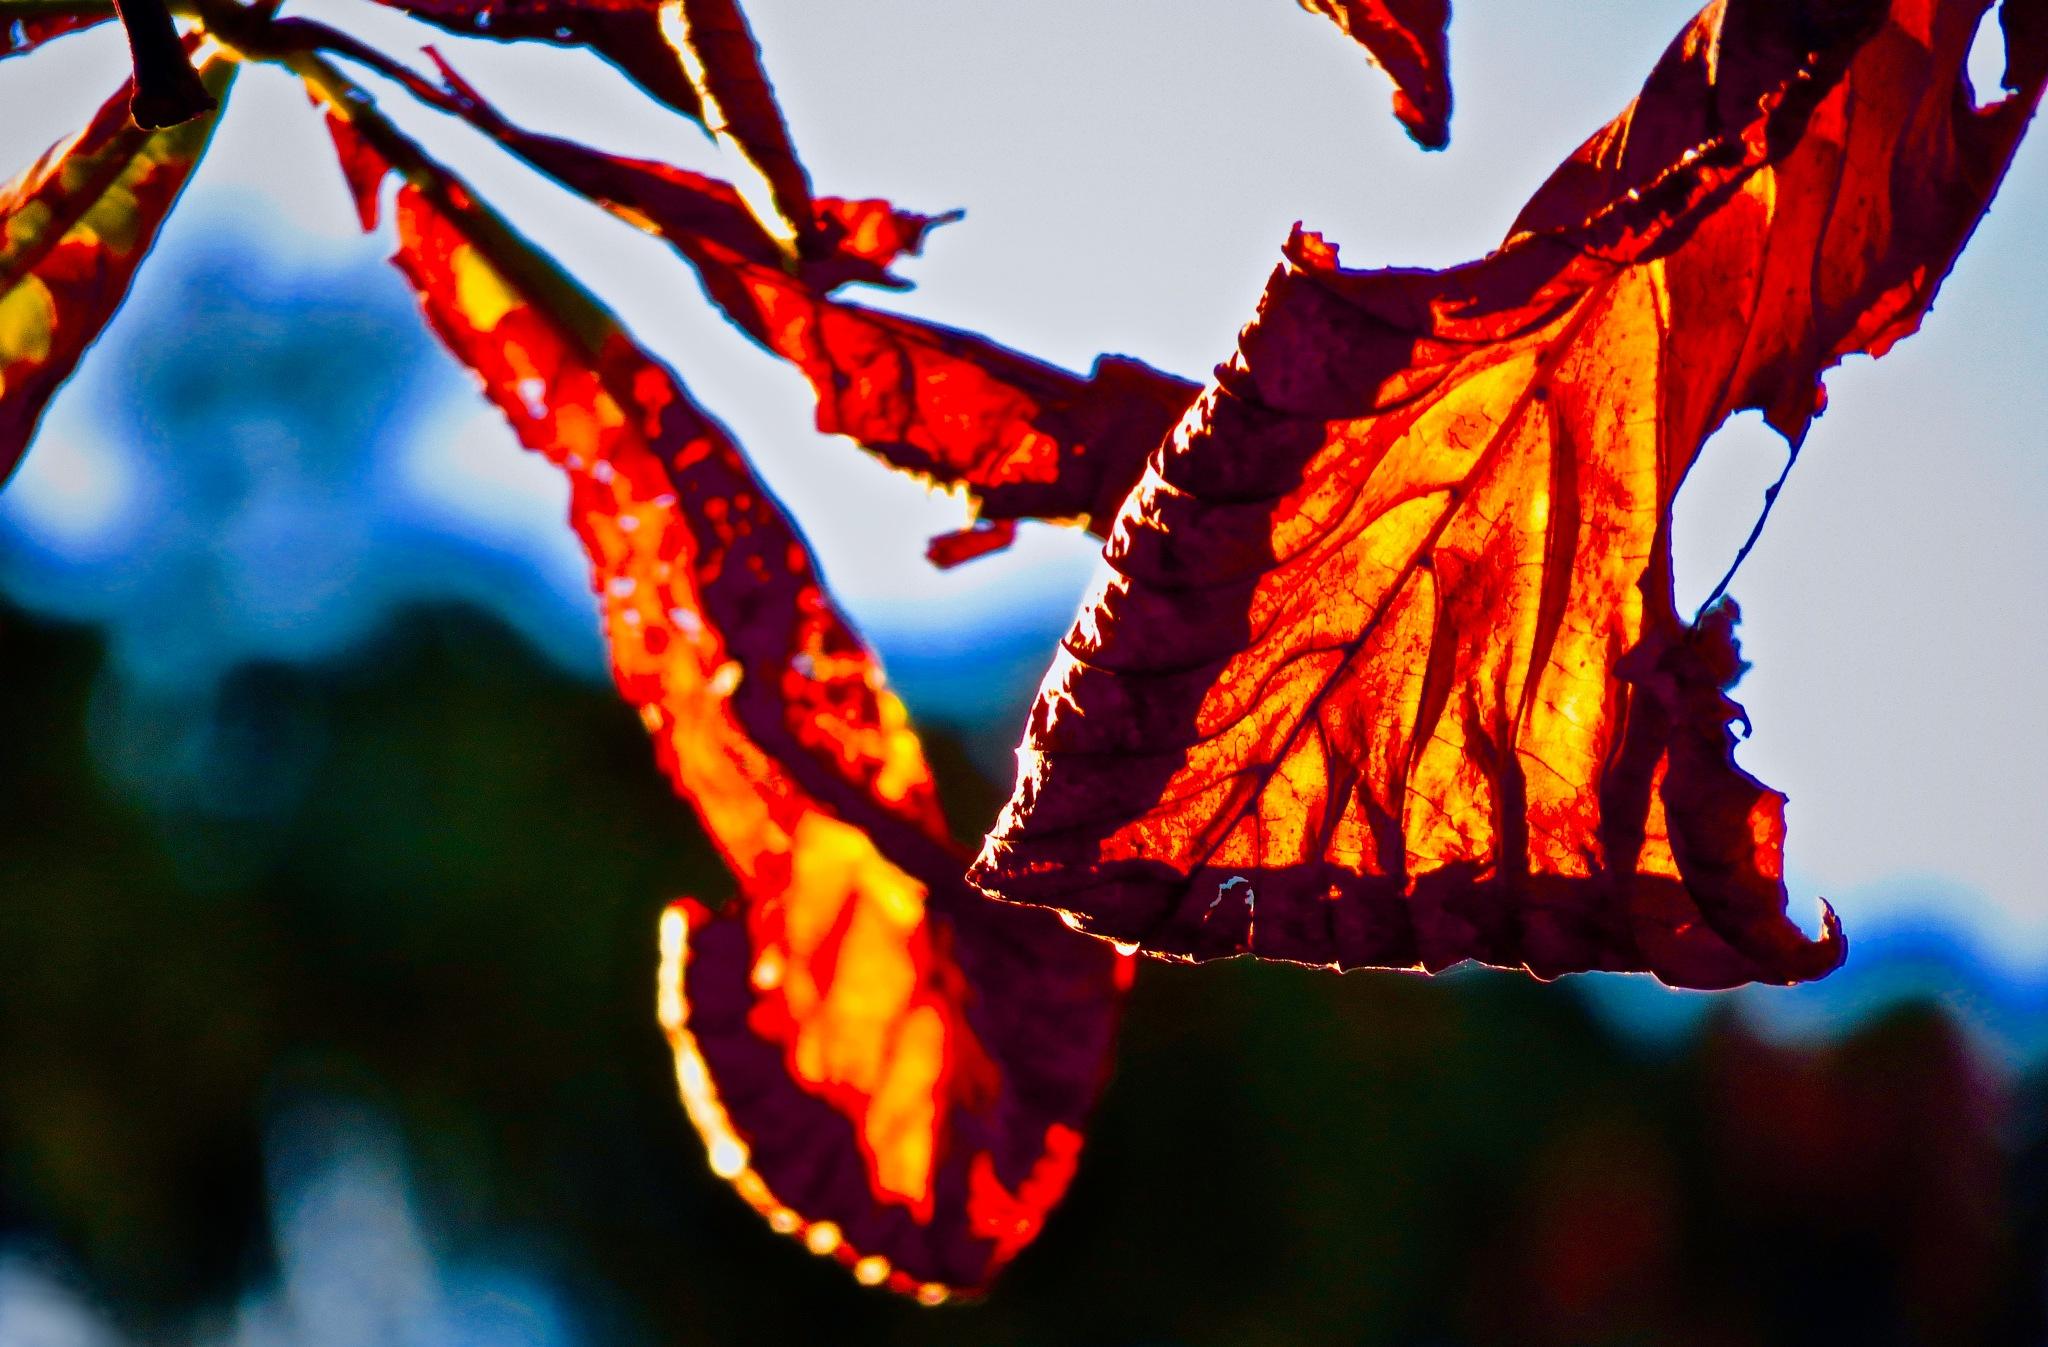 that so cool hue of flaming orange n red !! by David Devion